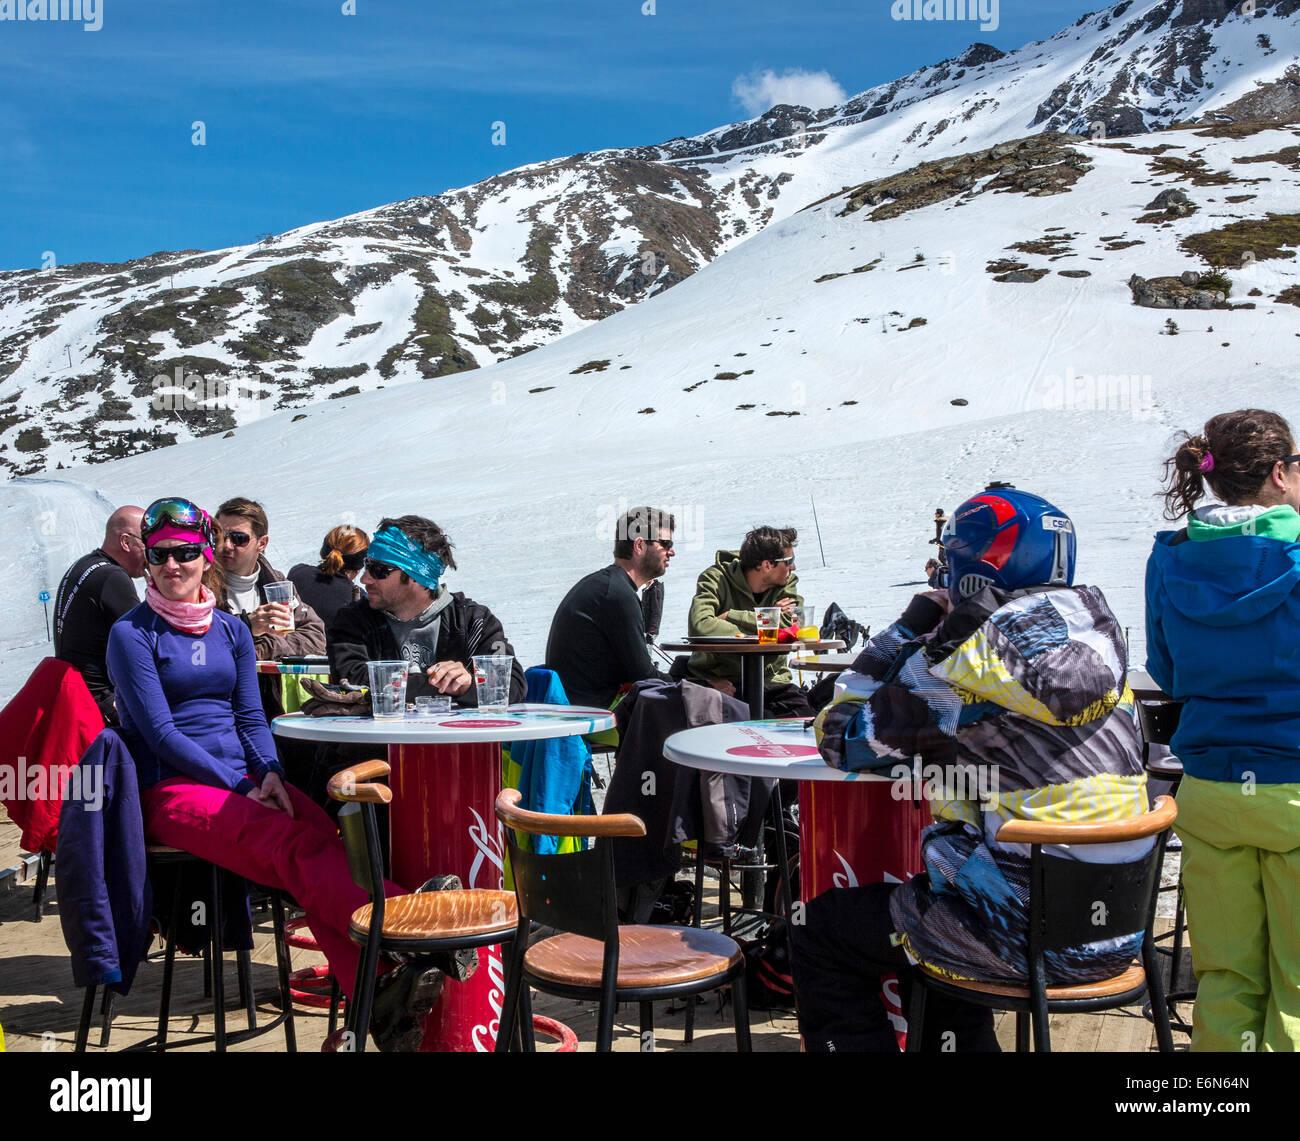 Terrace of the Bulle Cafe bar restaurant in Les Arcs 2000 ski resort, Les Arcs, Savoie, Rhone Alpes, France - Stock Image